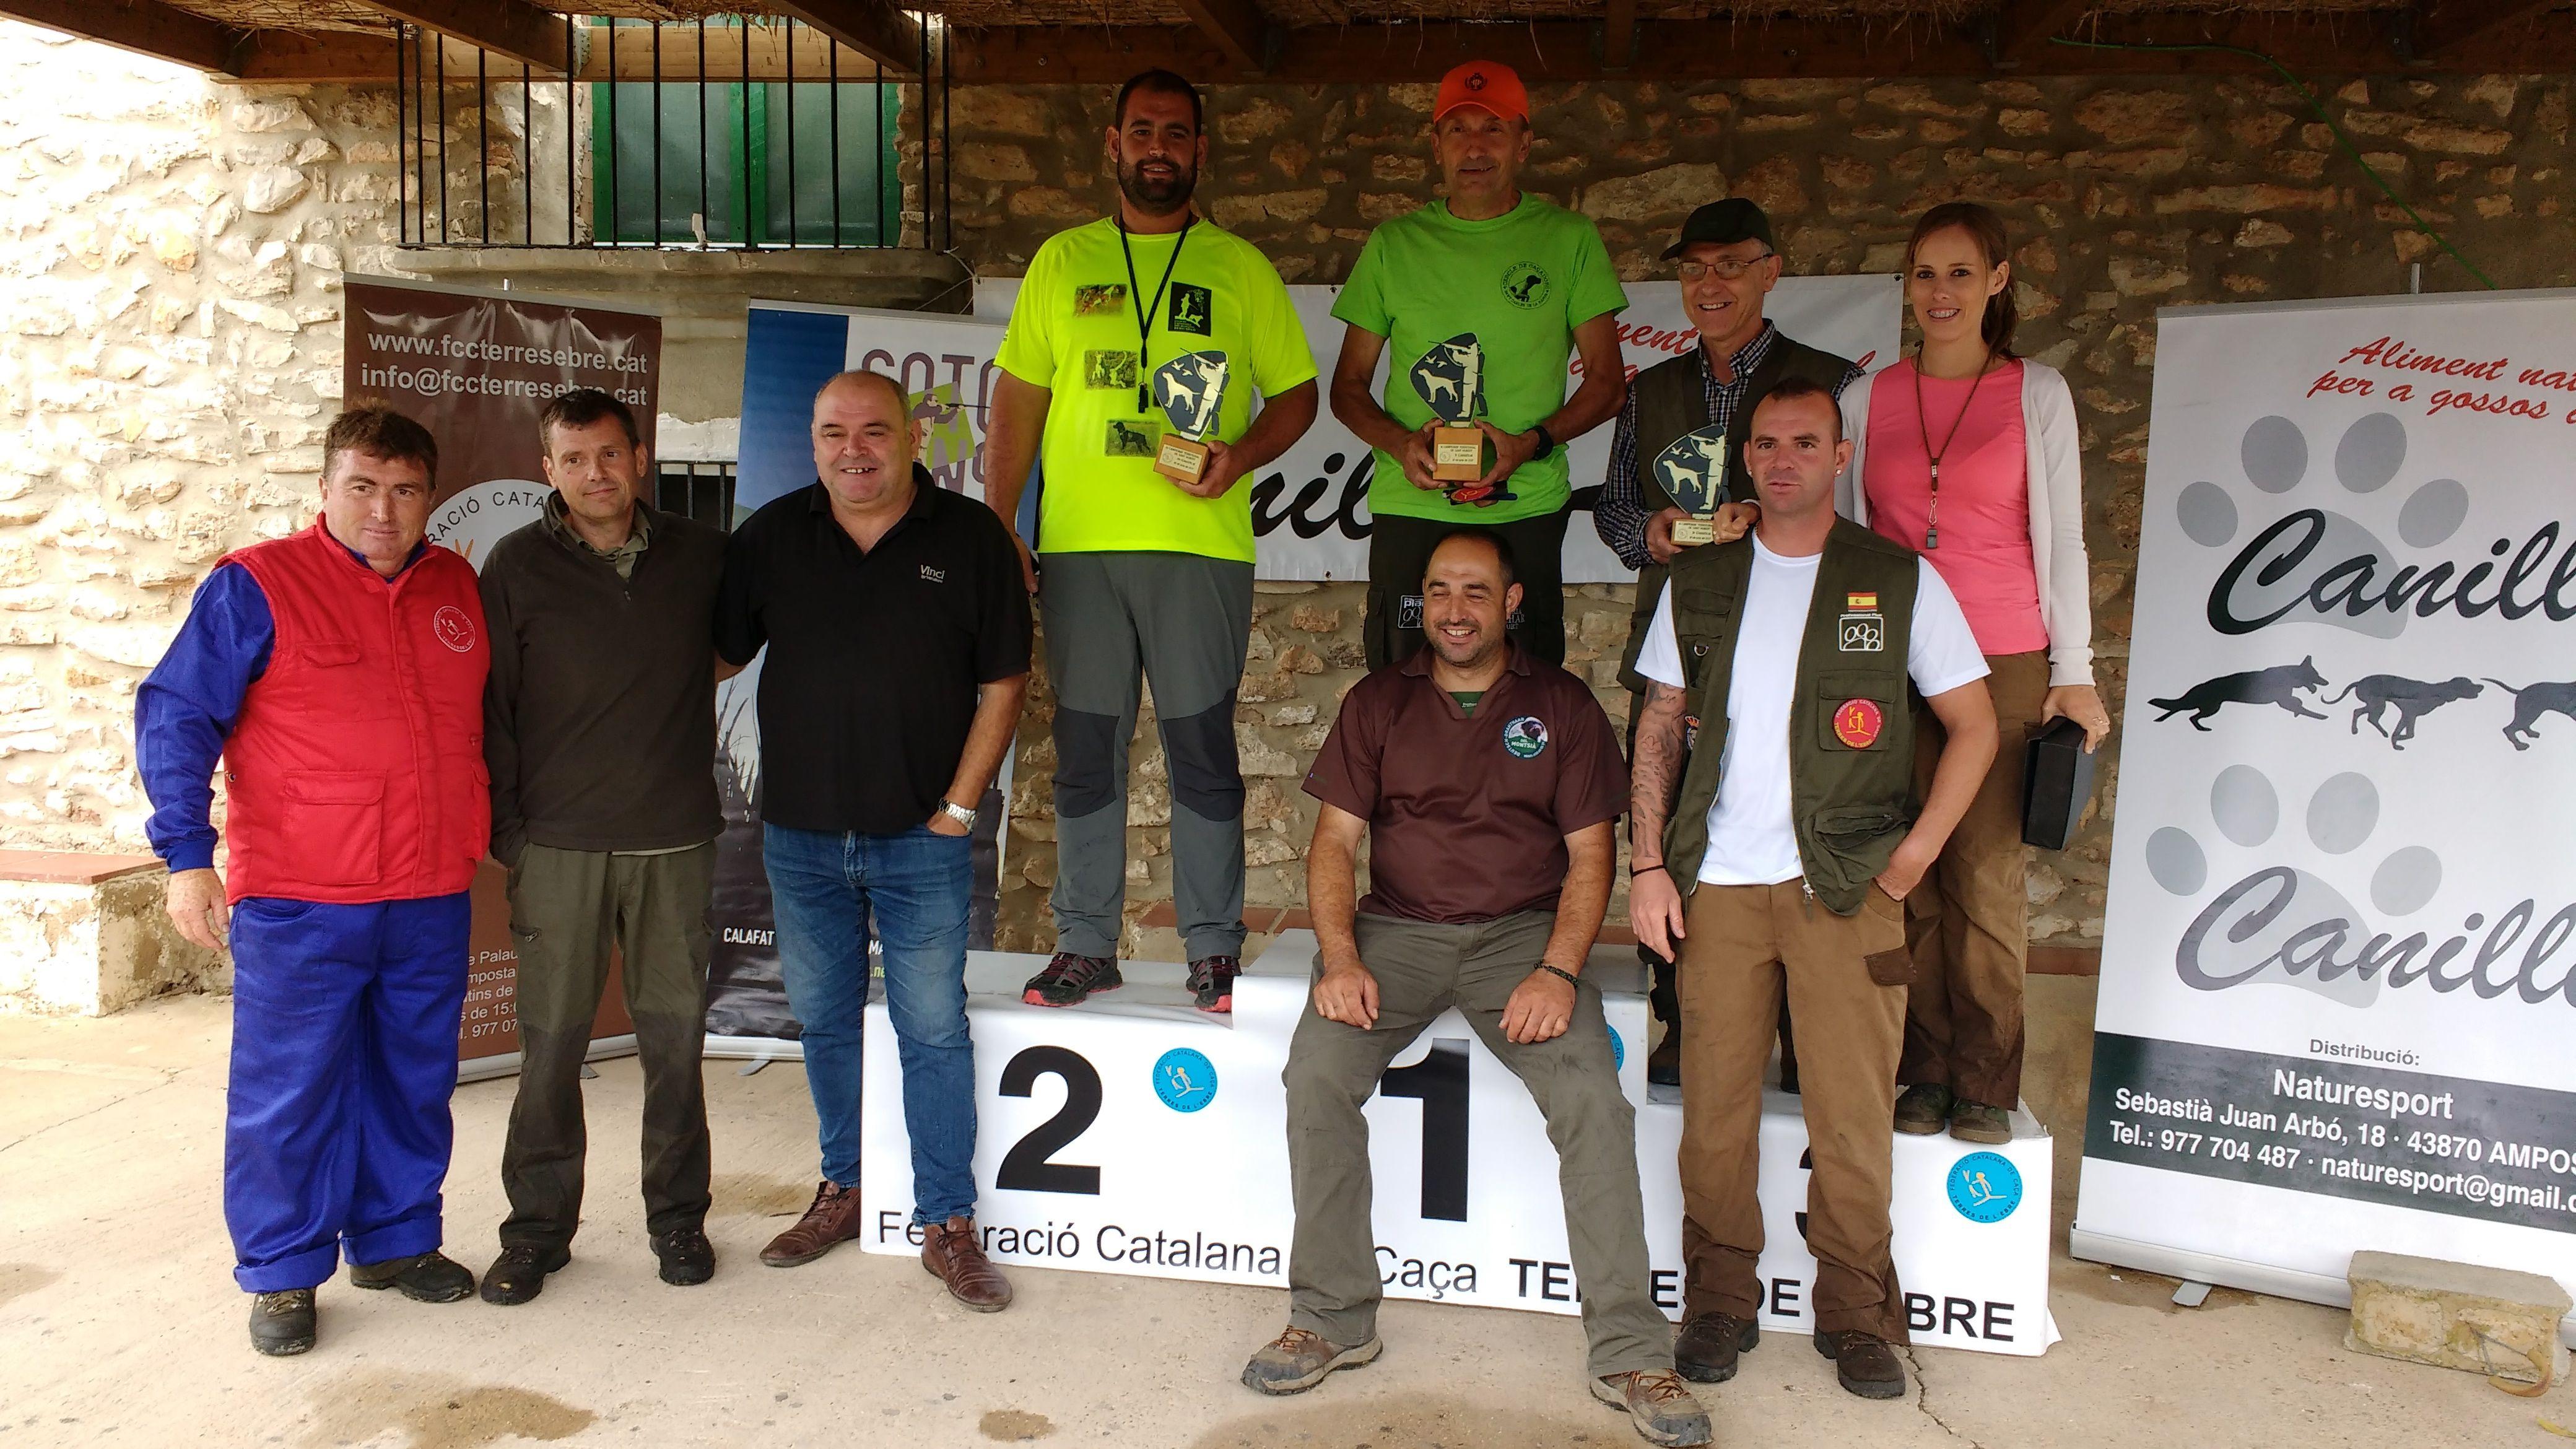 XI Campionat Territorial de Sant Hubert